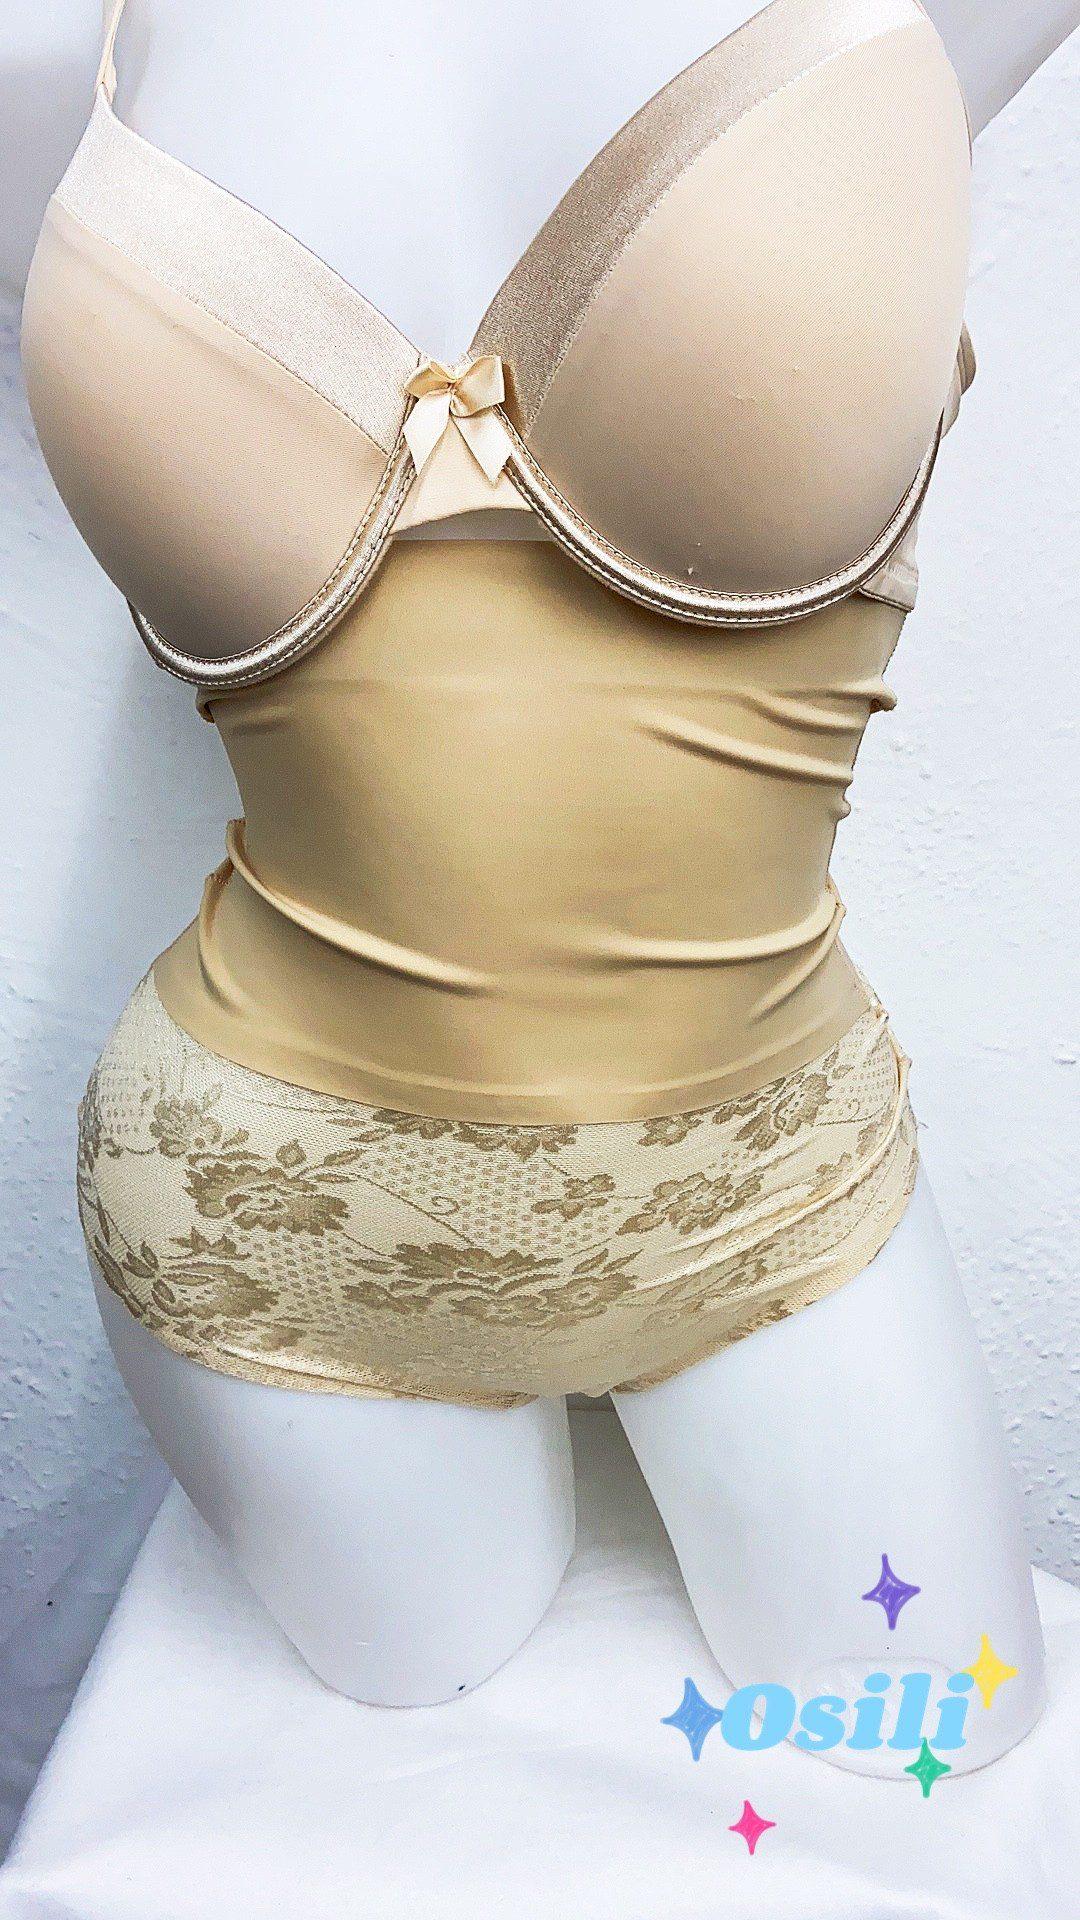 9689127B B051 442E AF89 925580053B6C Osili - Fashion - Divat